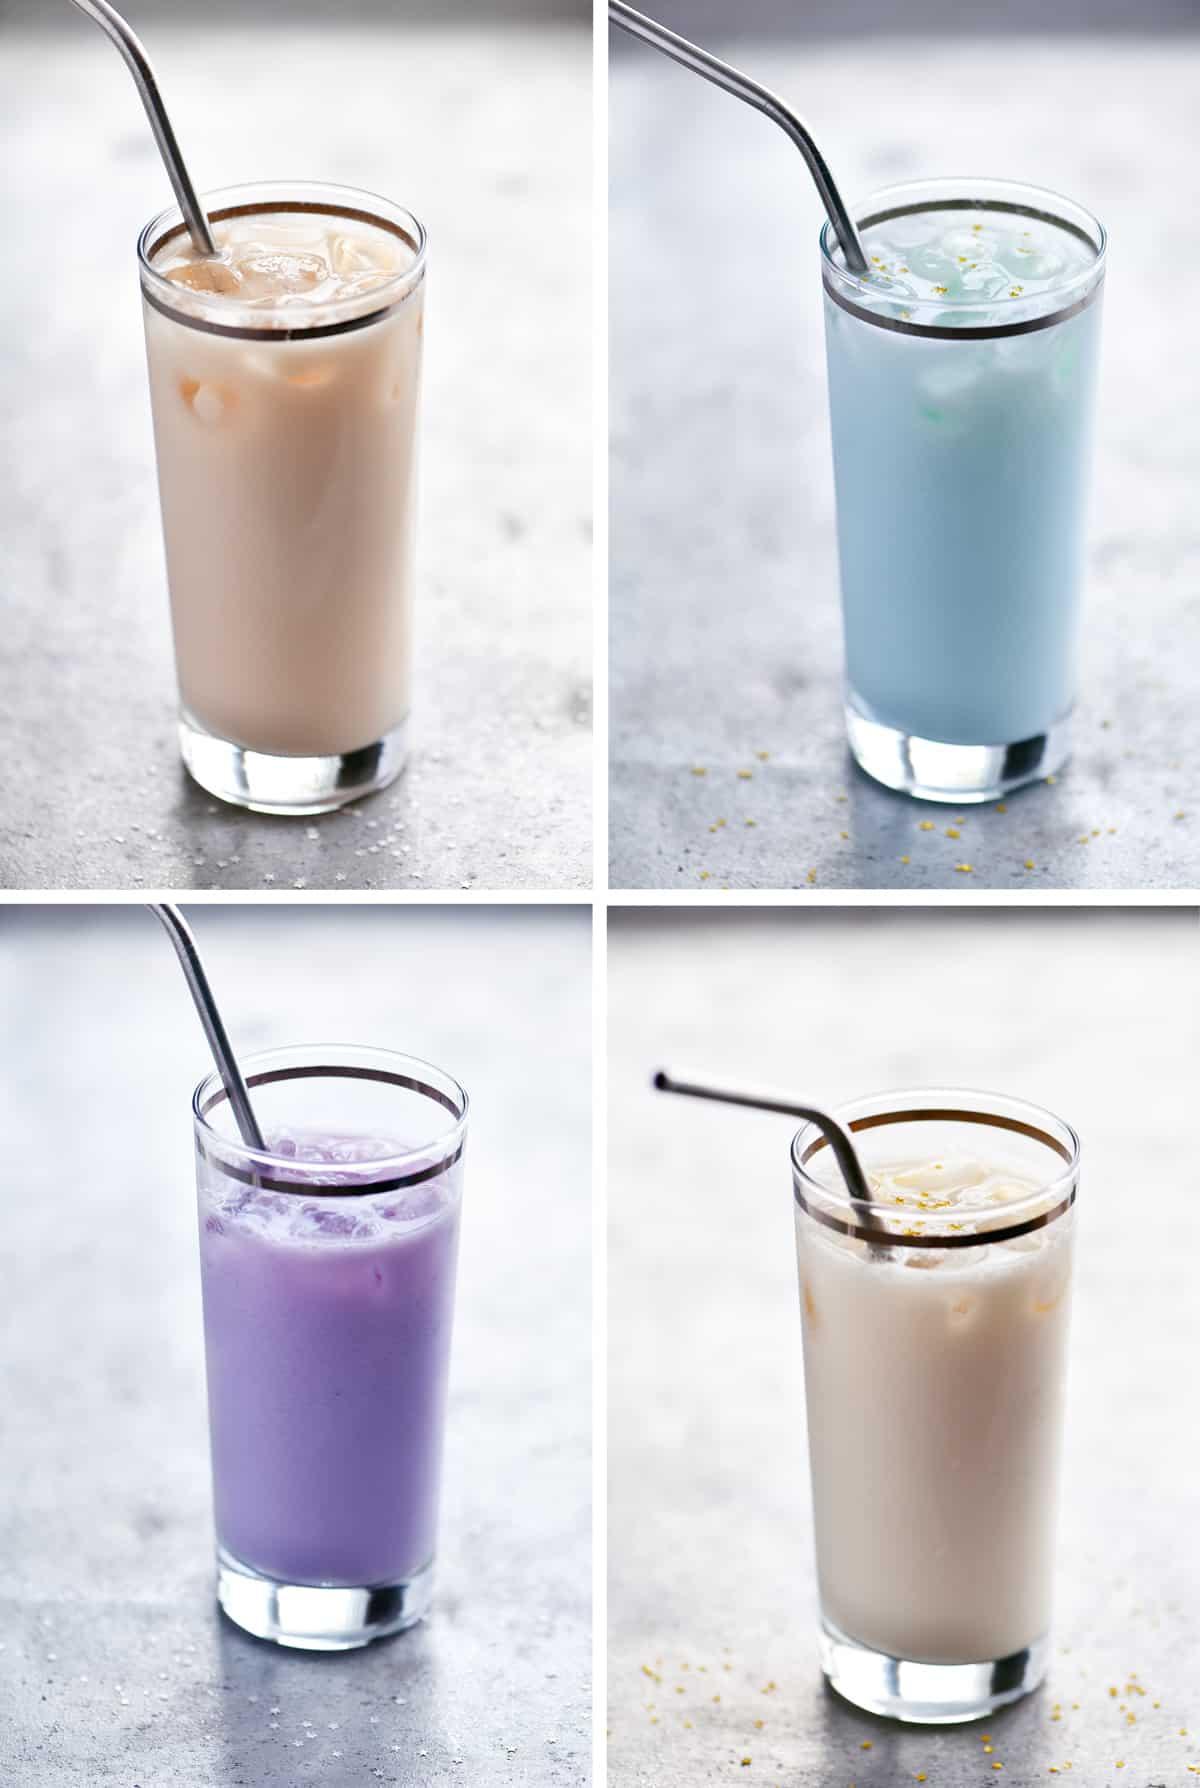 RedBull Drinks Collage